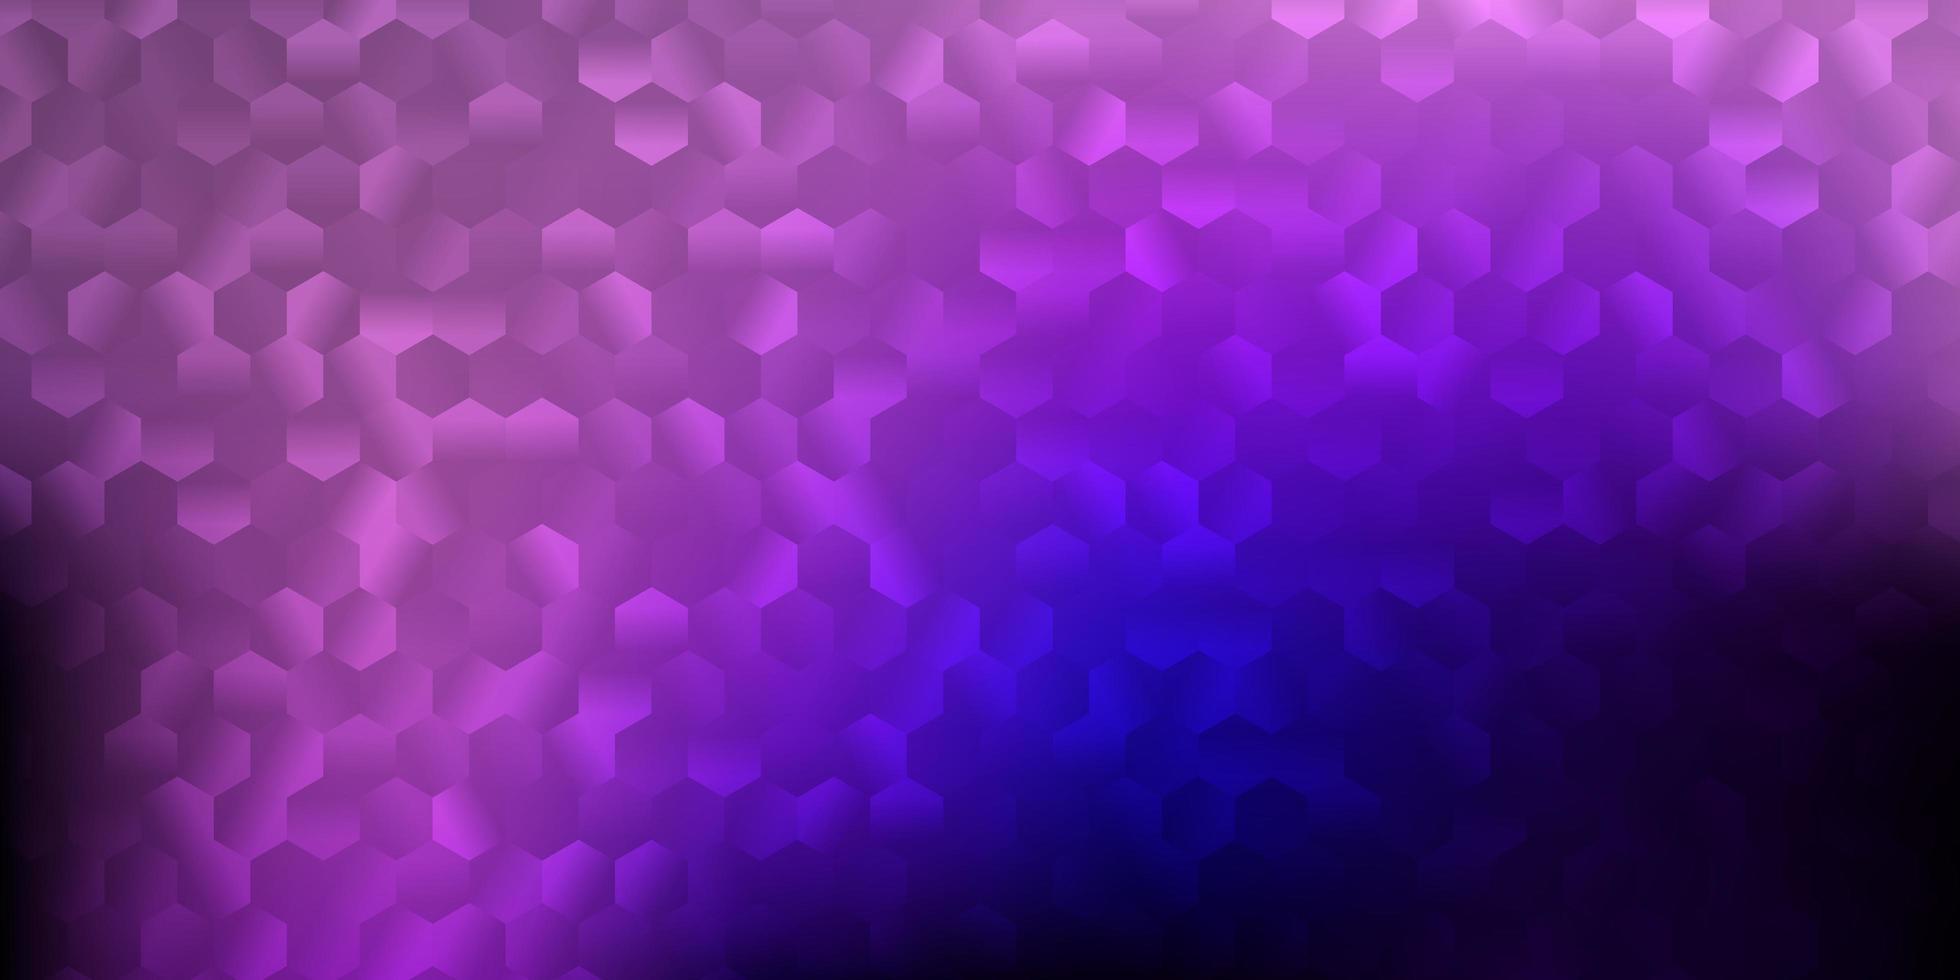 dunkelviolette, rosa Vektorbeschaffenheit mit Memphisformen. vektor